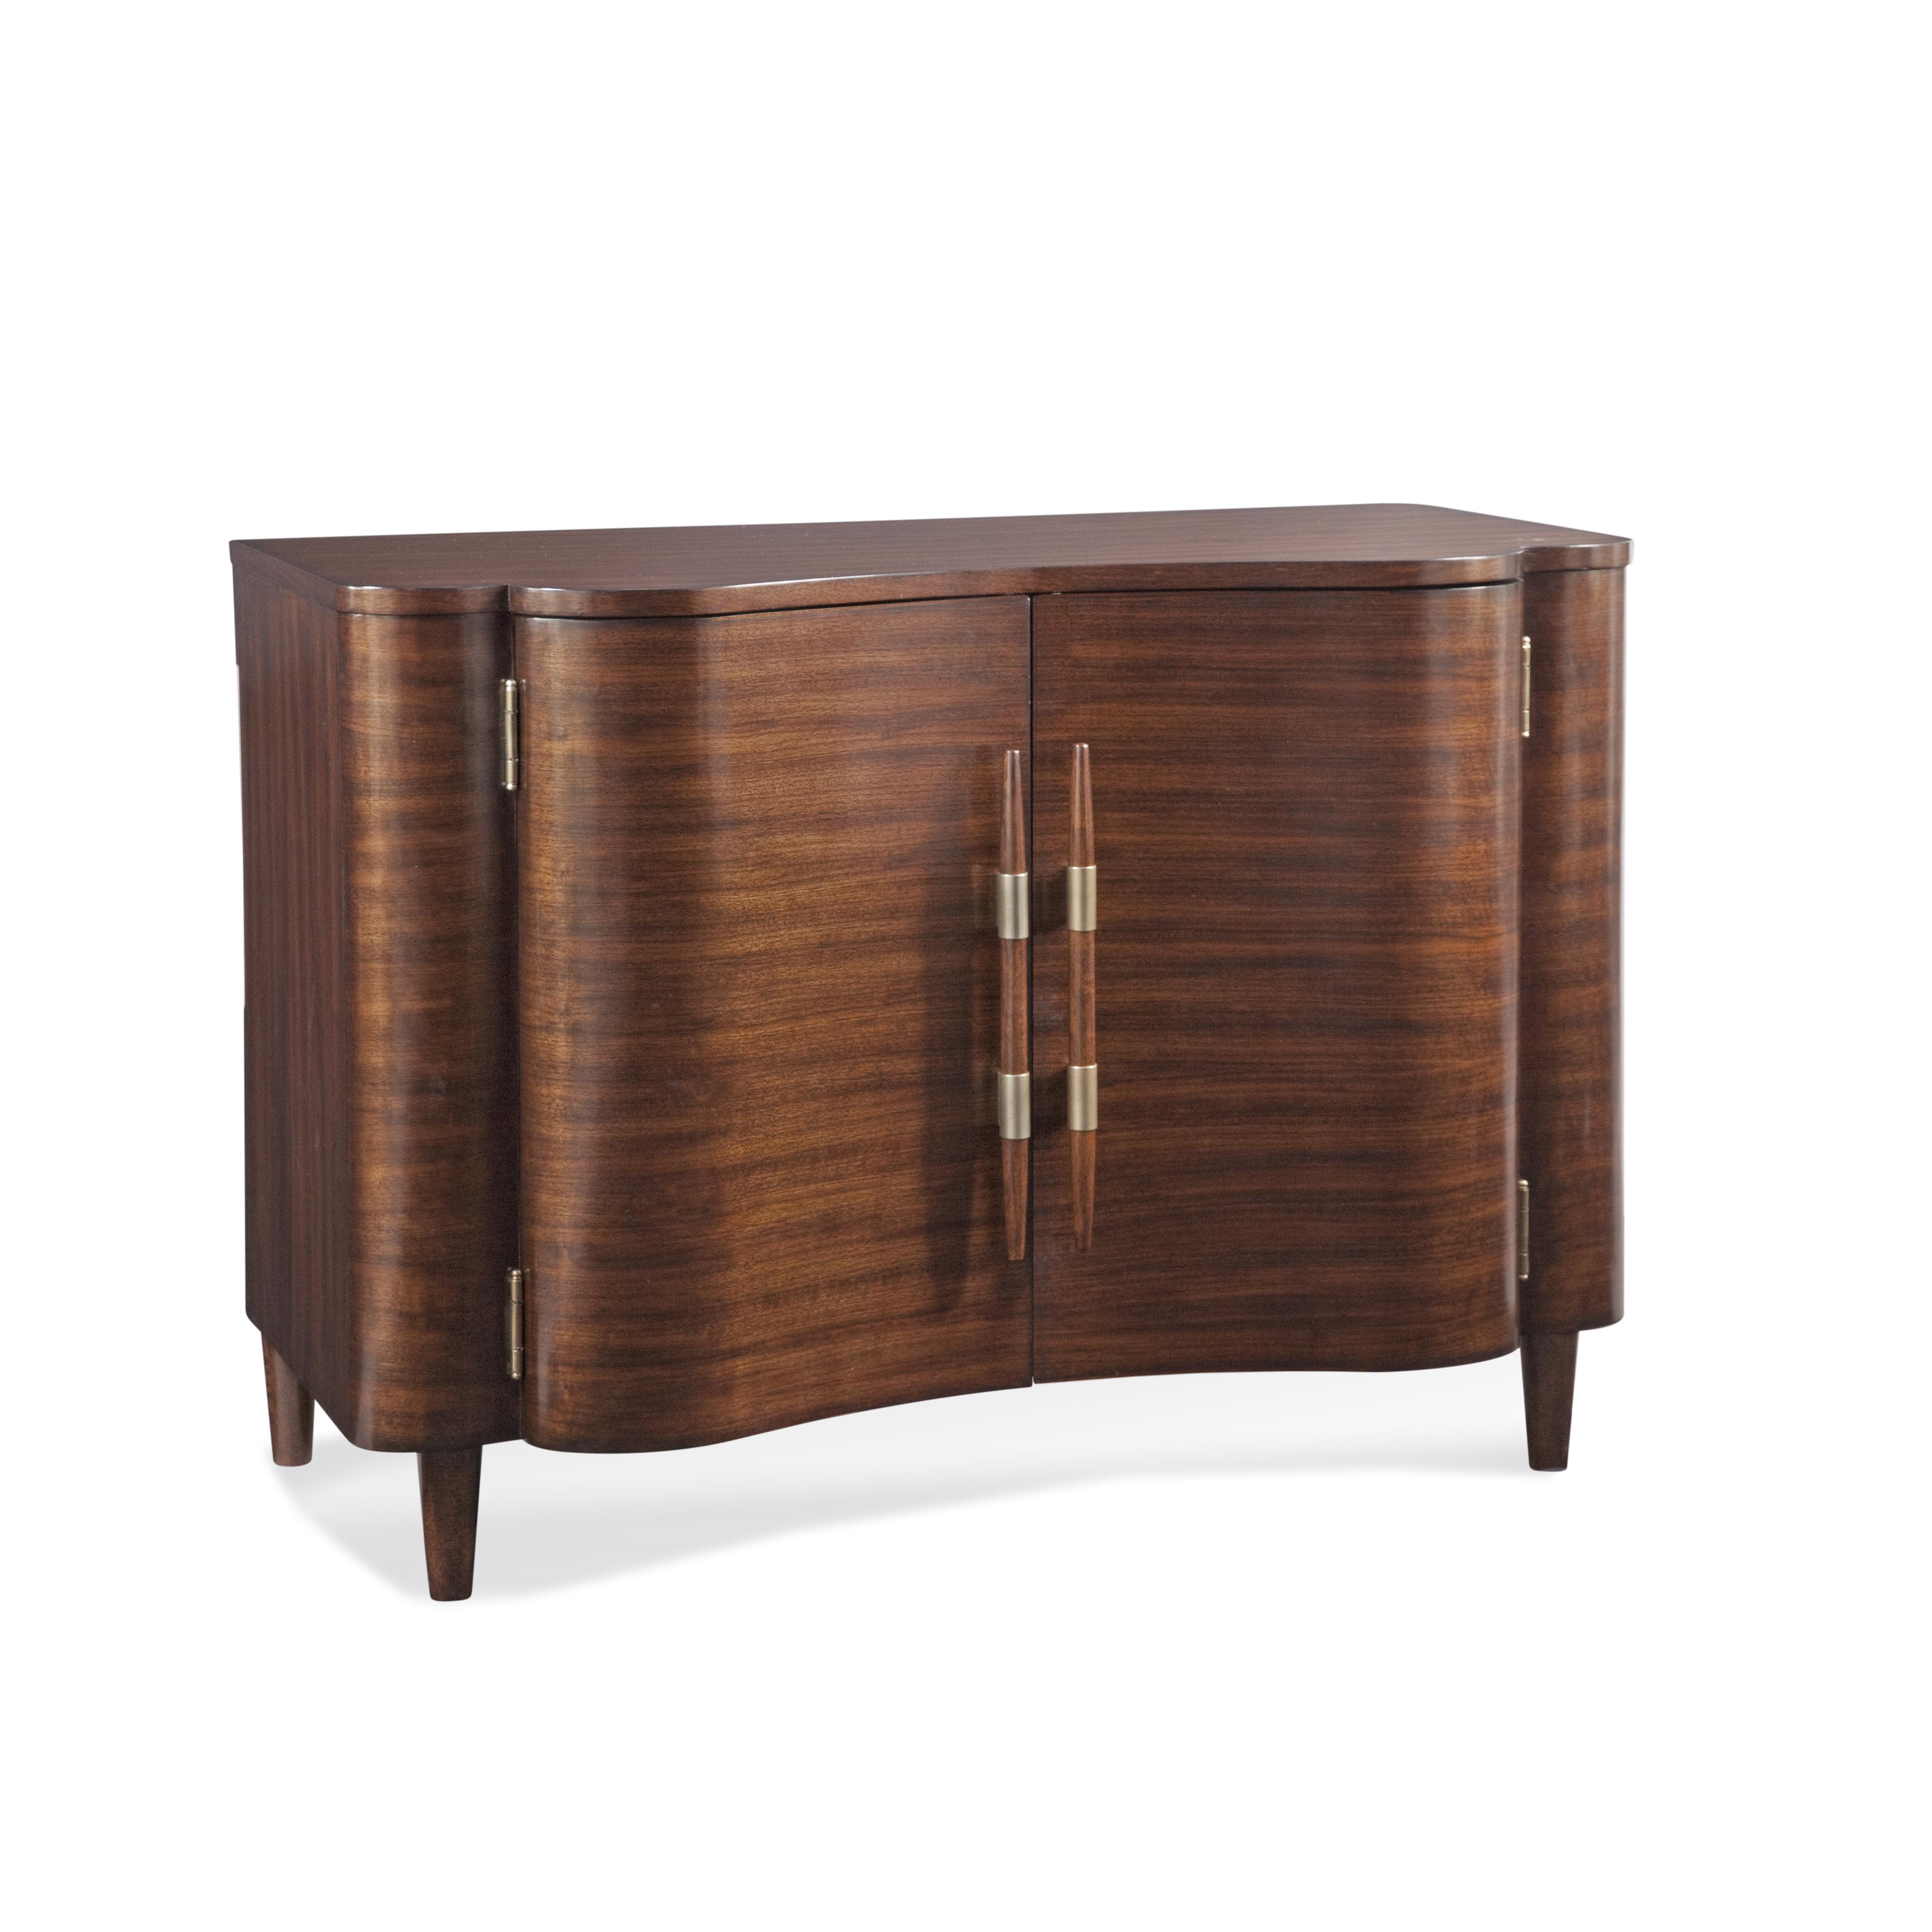 In-Town Darrien Bar Cabinet by Bassett Mirror at Lapeer Furniture & Mattress Center